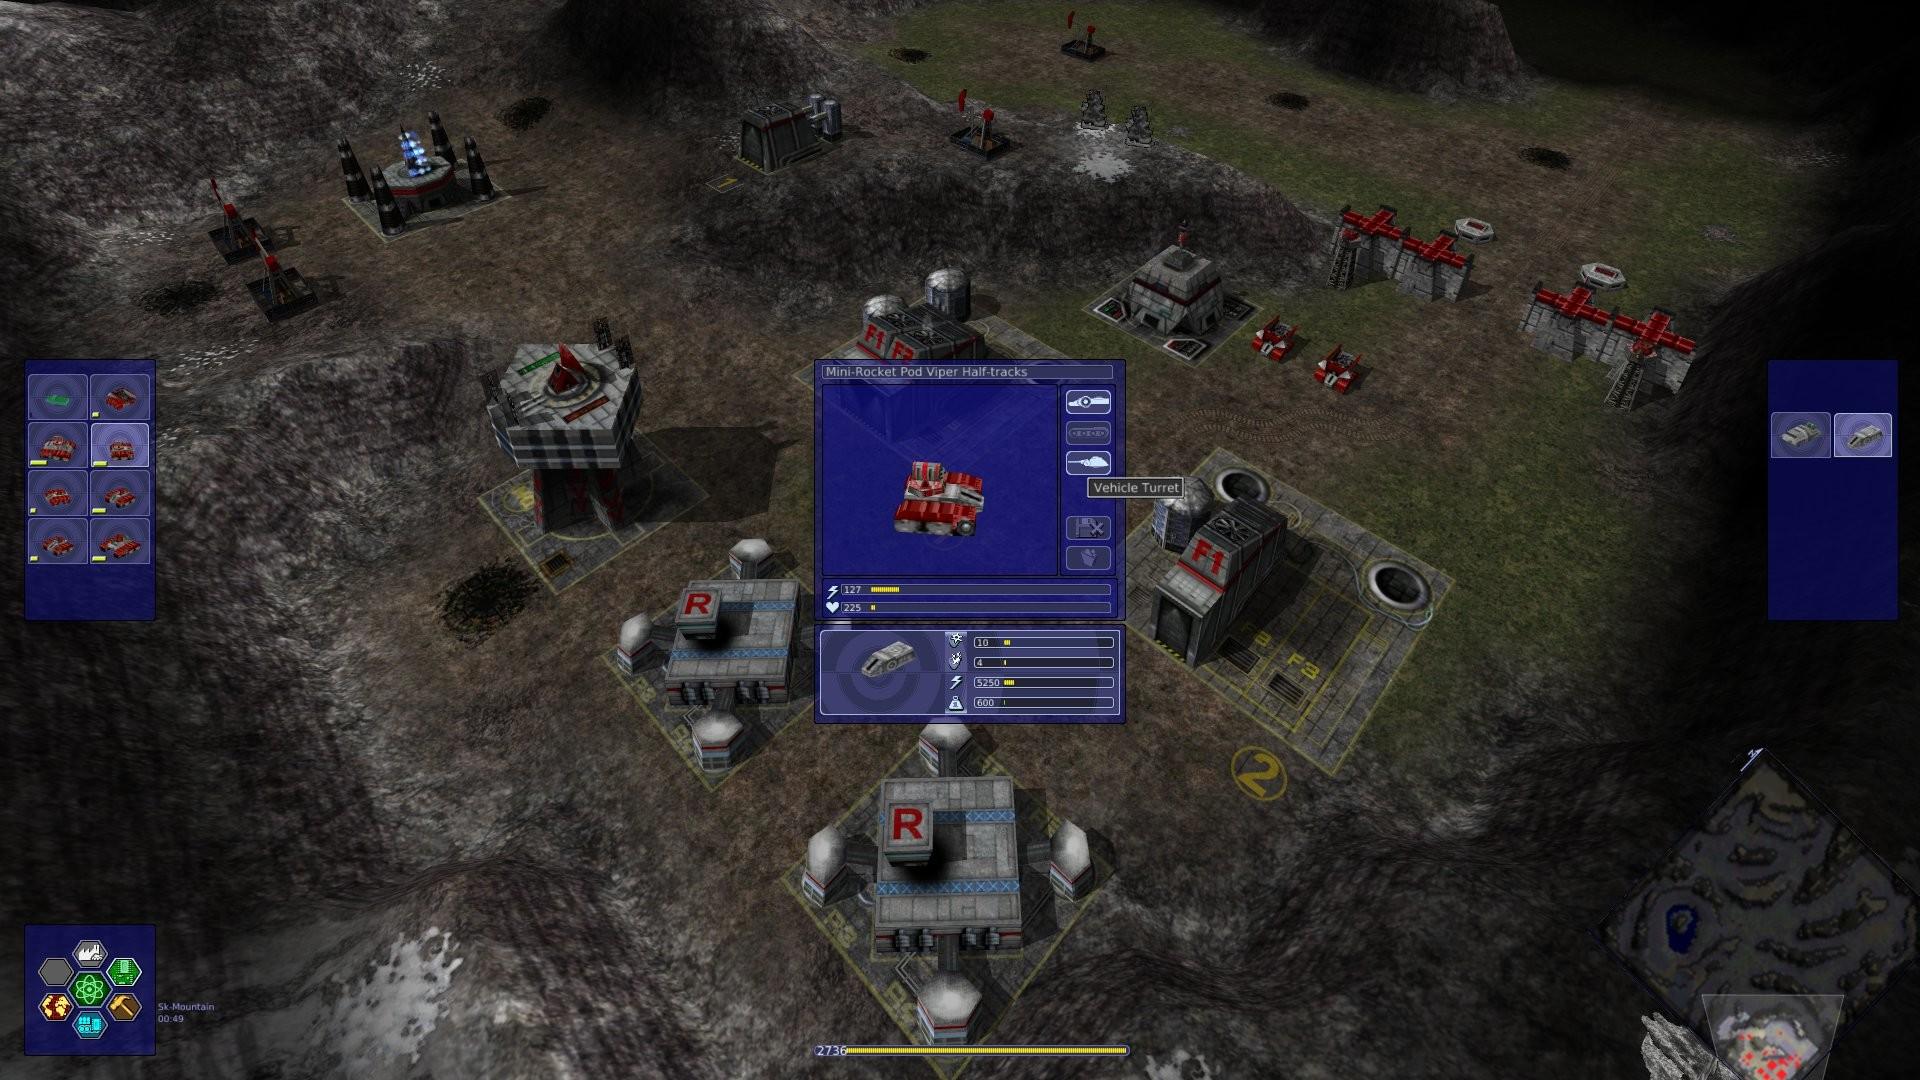 Screenshot 1 - Warzone 2100 Portable